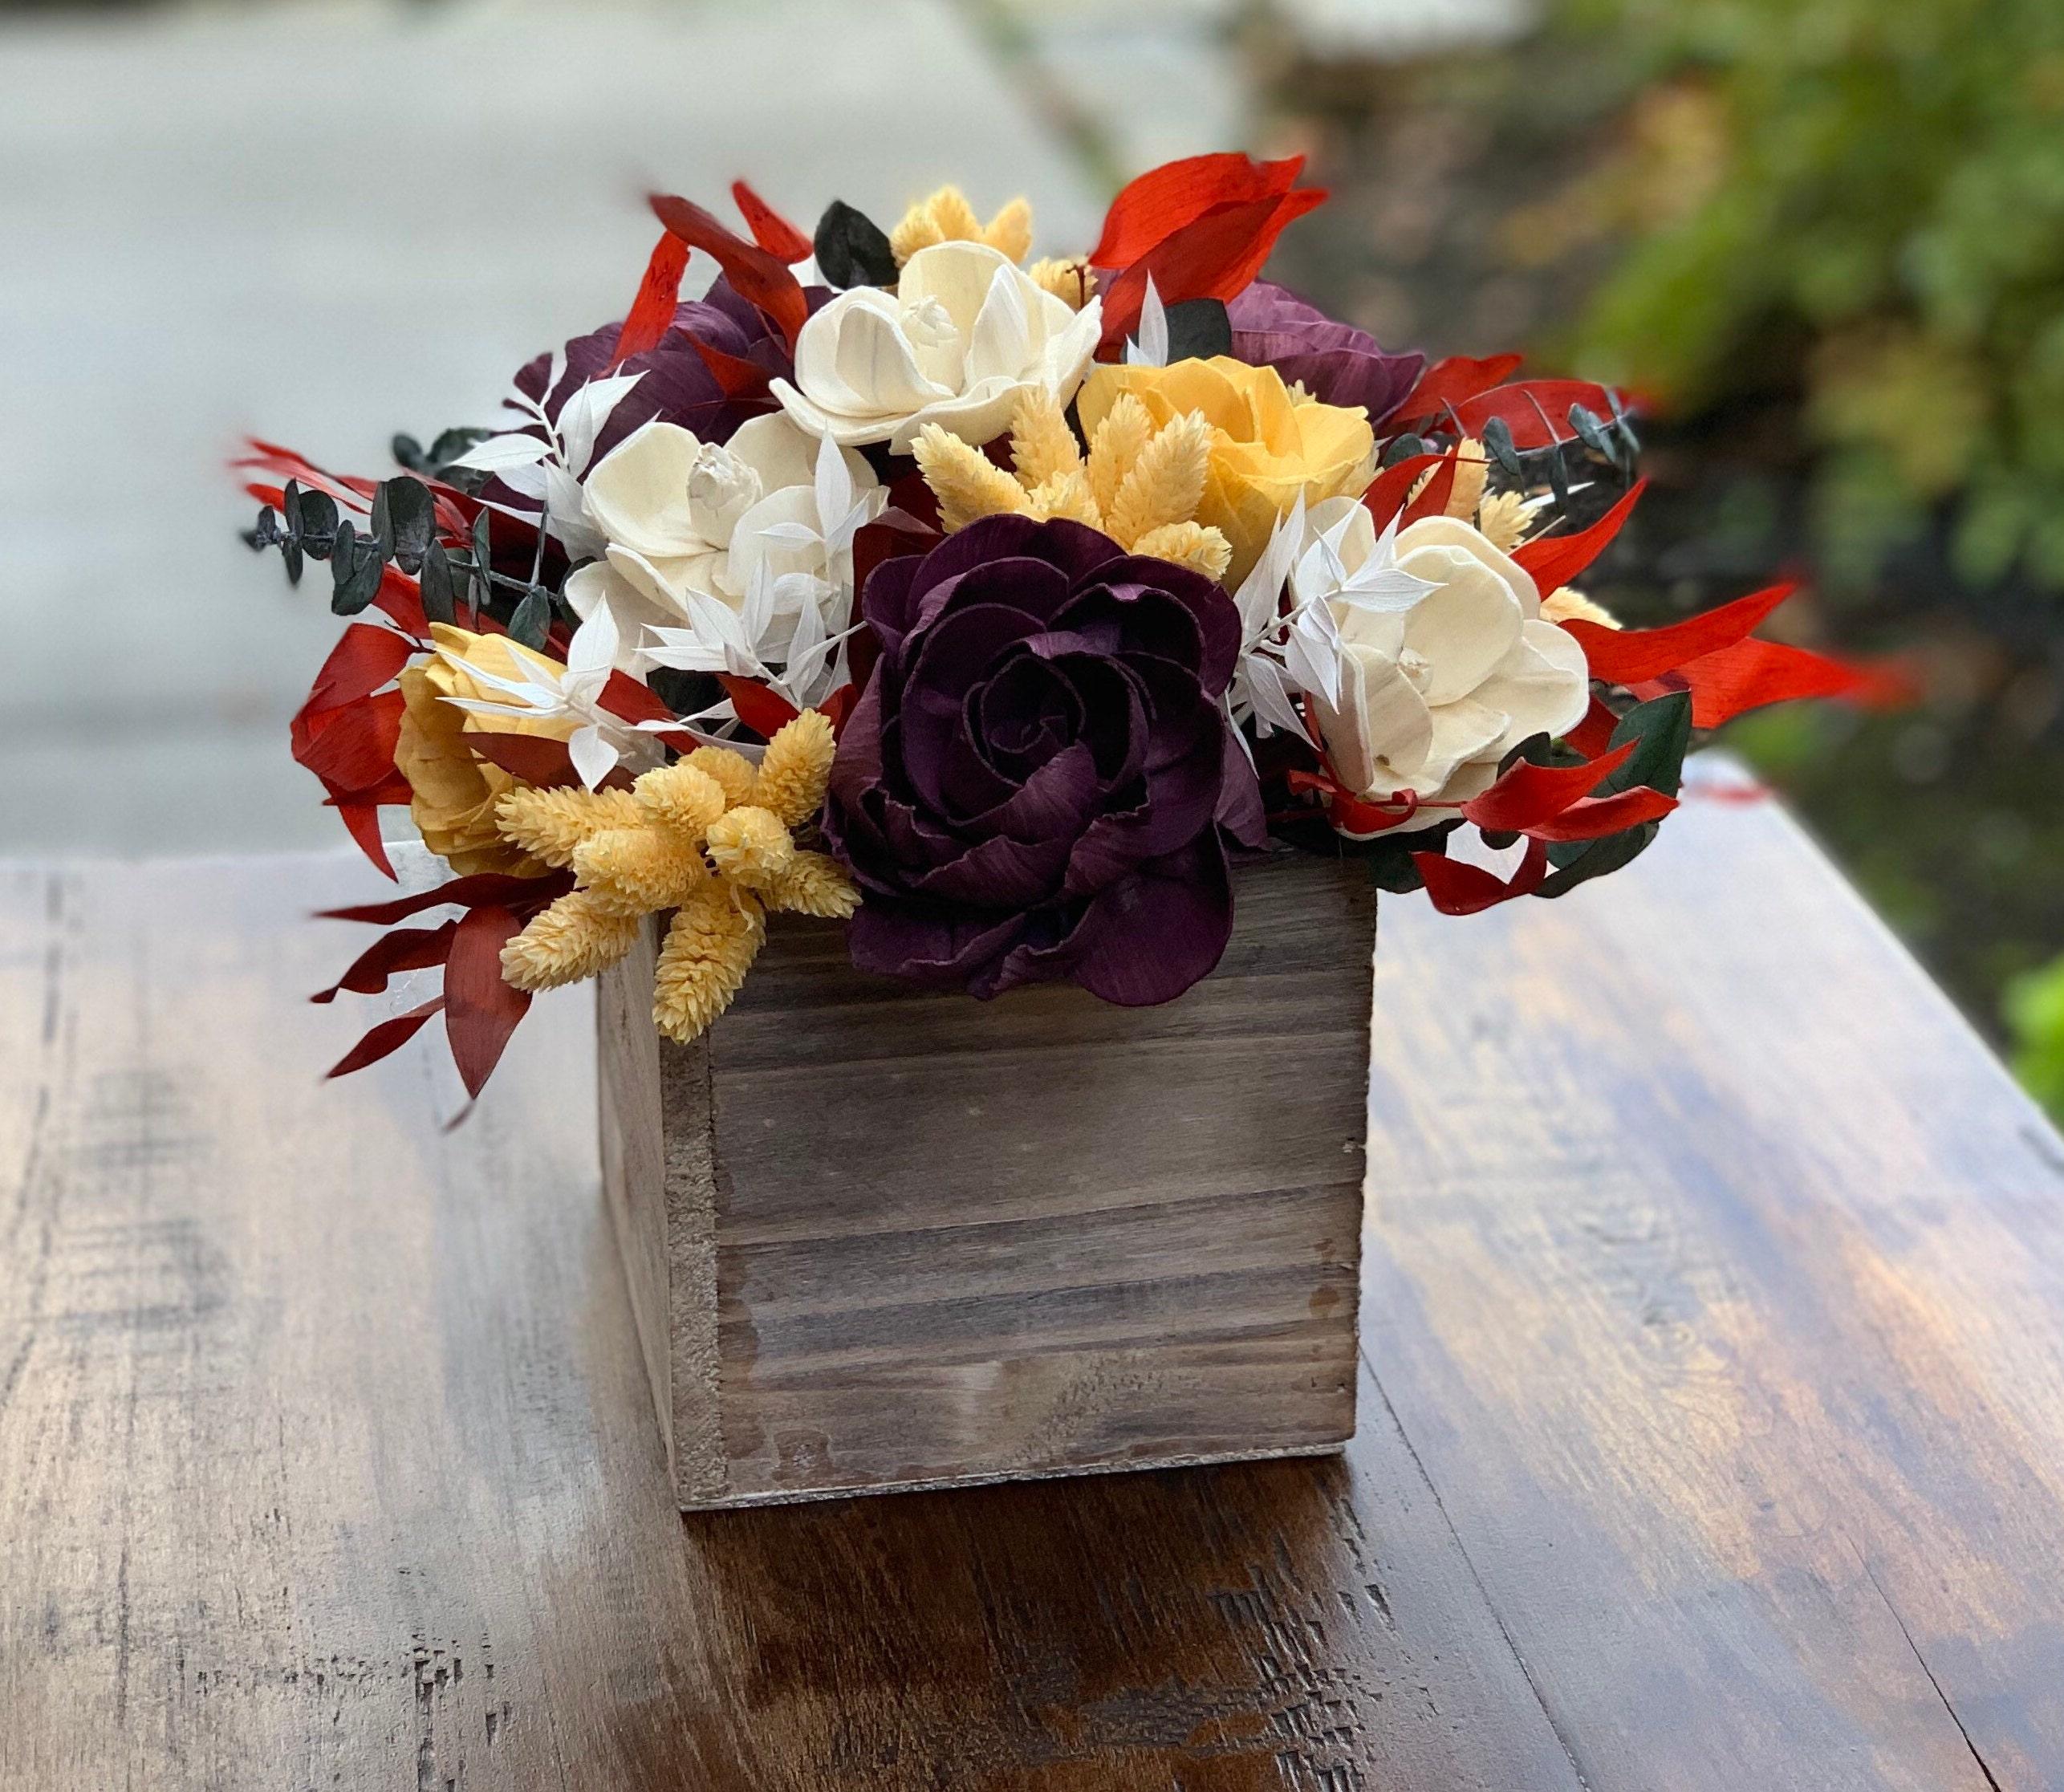 Boho Feel Fall Keepsake Sola Flower Arrangement Autumn Floral Centerpiece